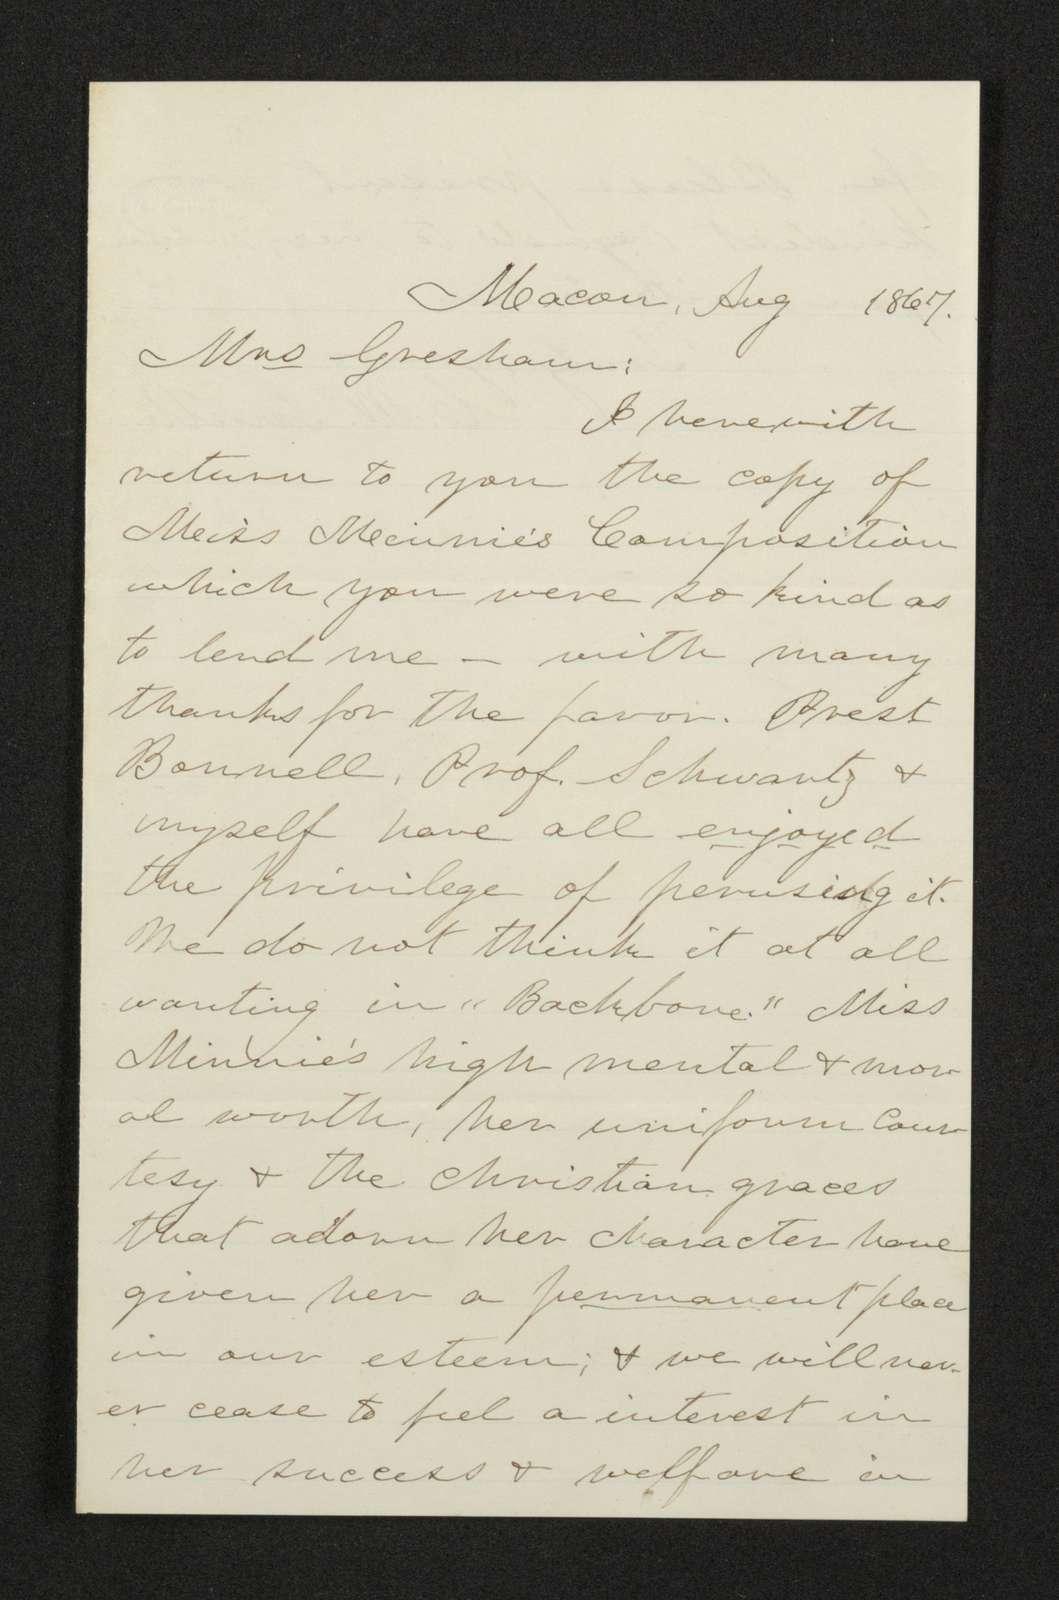 Lewis H. Machen Family Papers: Gresham Family Correspondence, 1834-1925; 1867